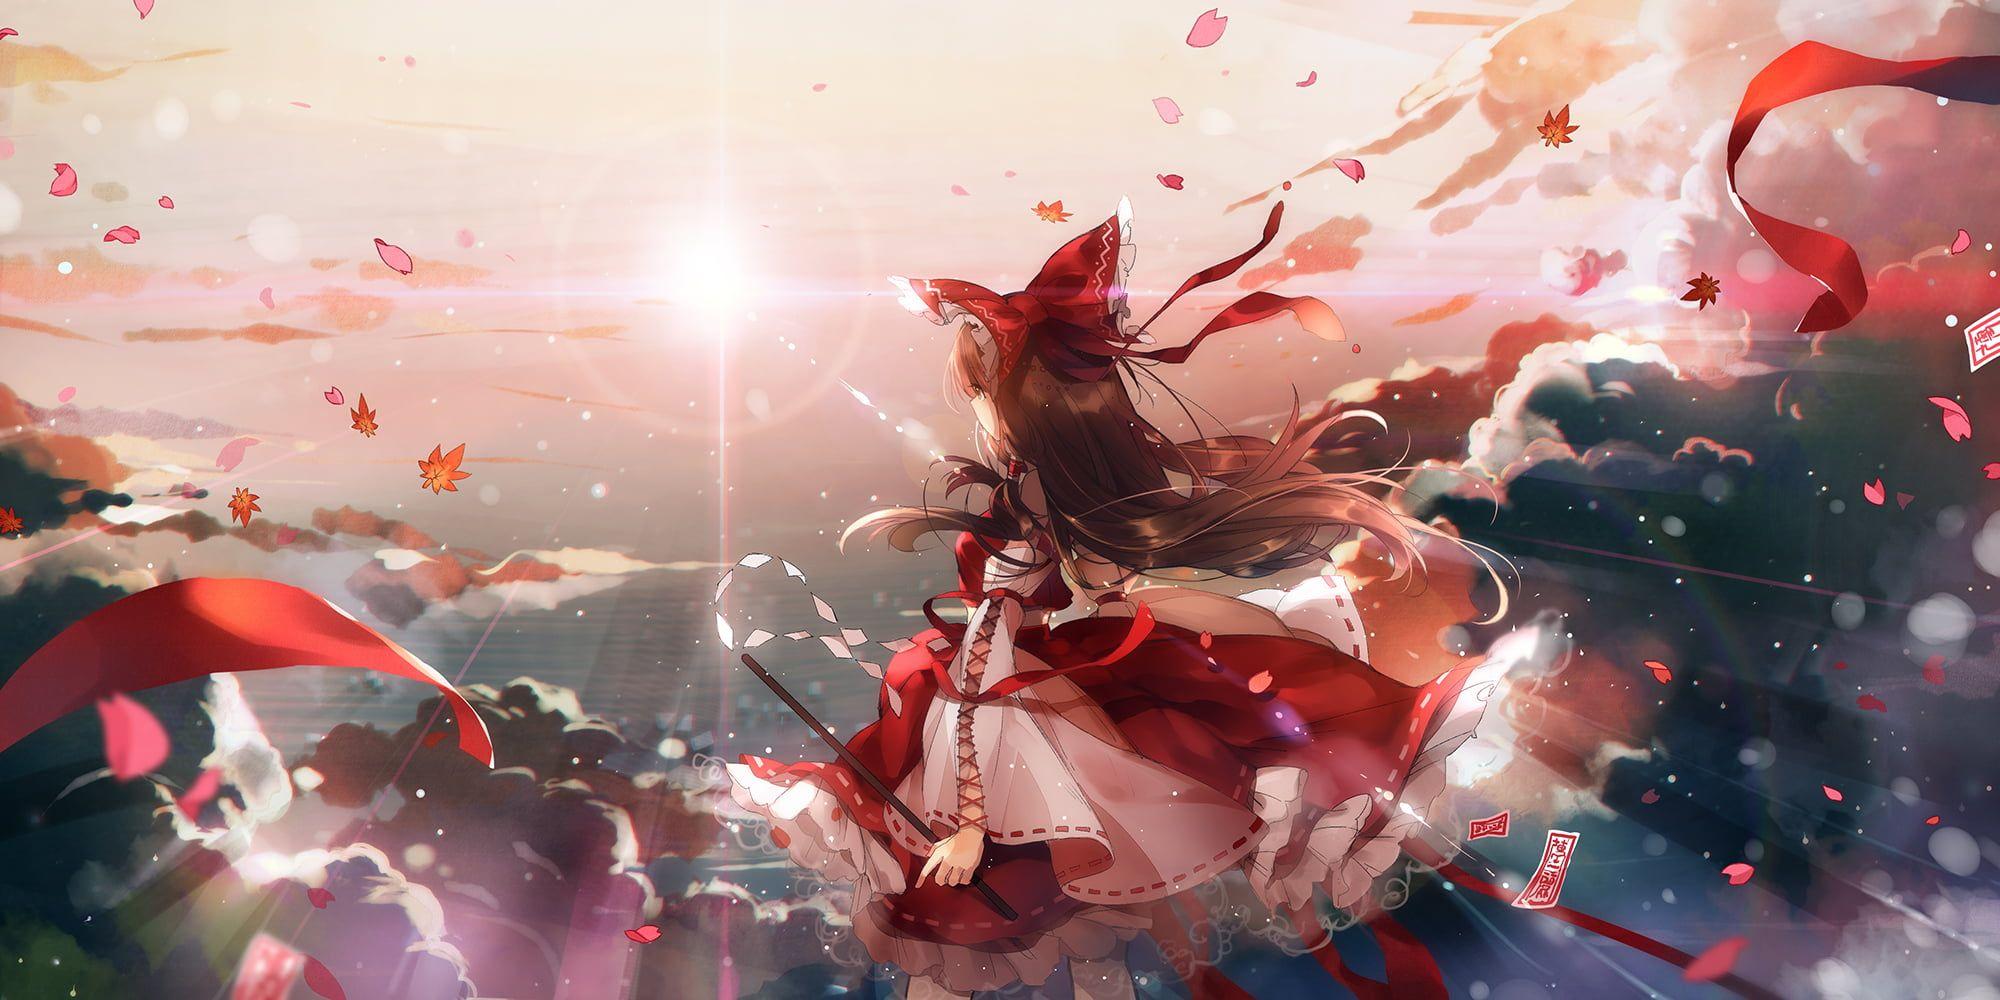 Pin On Anime 25 anime art fantasy wallpapers